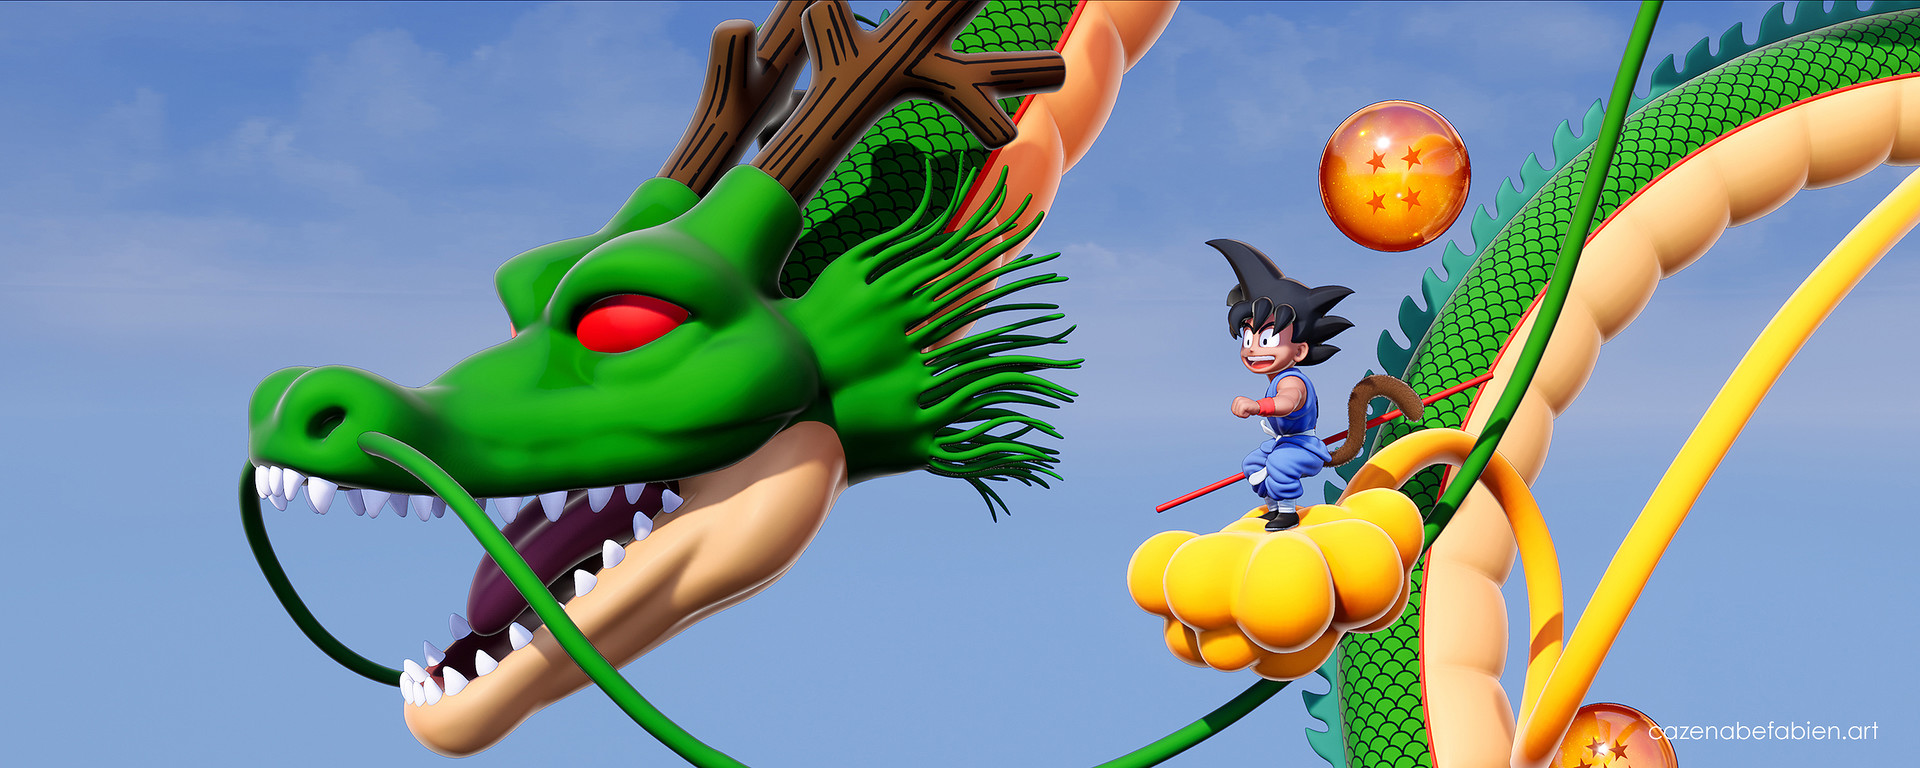 Fabien cazenabe sangoku dragon ball sculpt zbrush unreal 3d 05